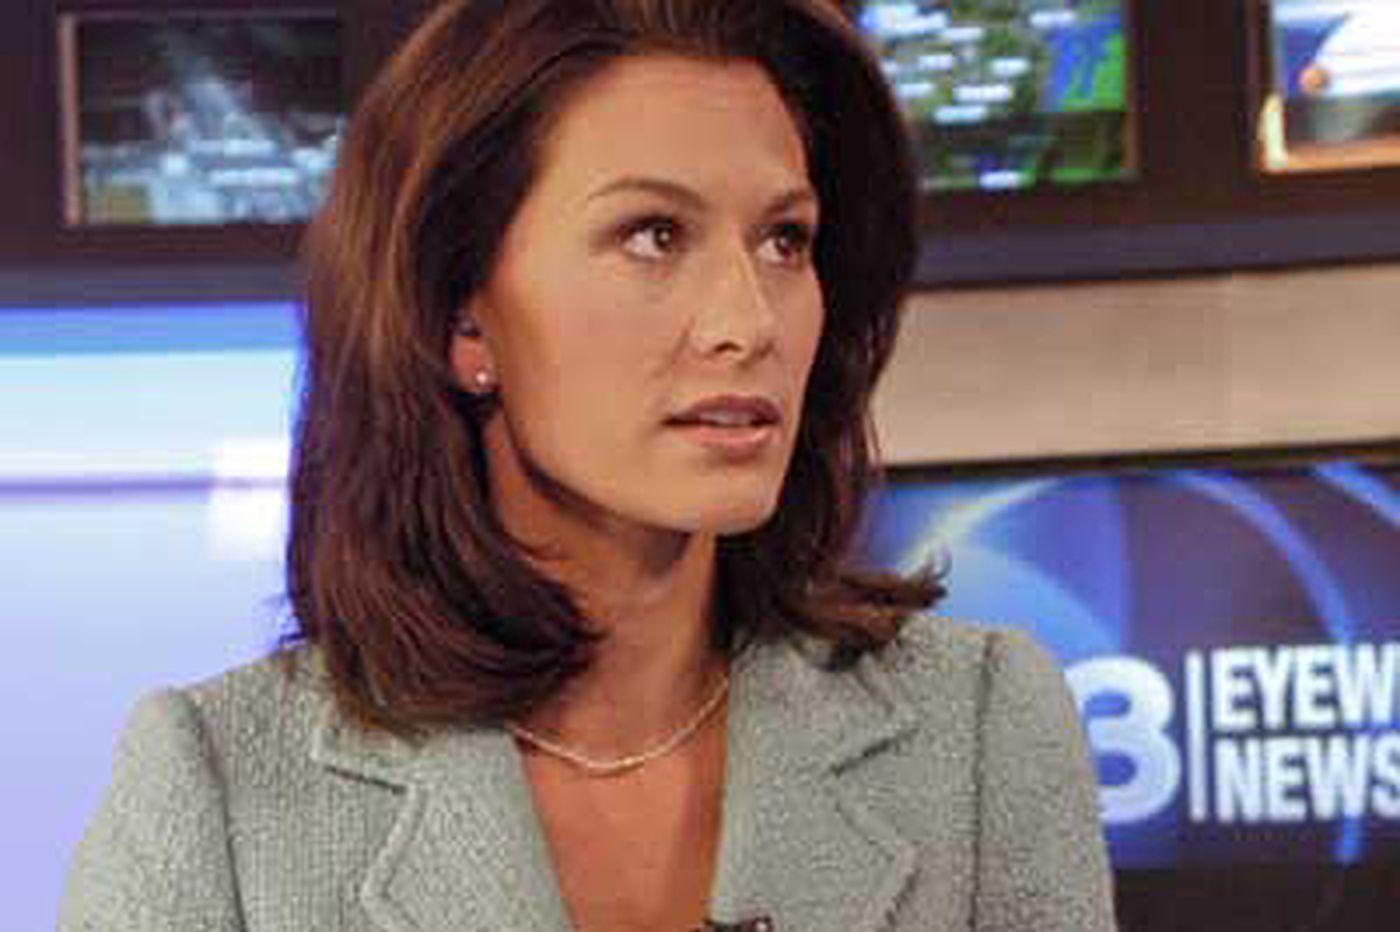 Alycia Lane sues CBS3